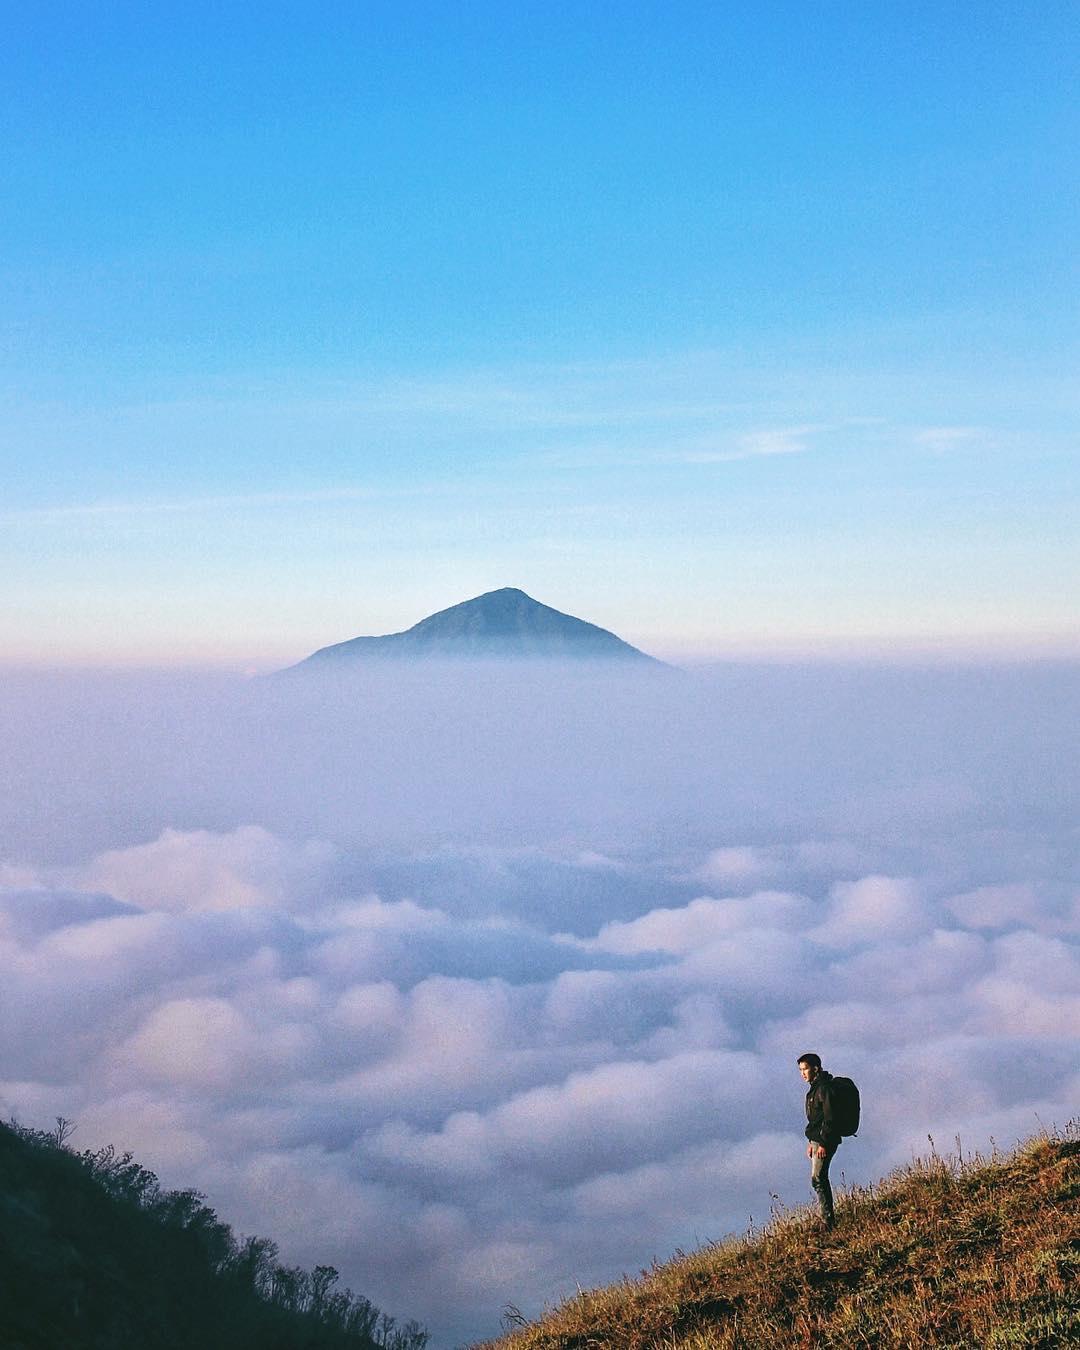 Gunung Guntur, Garut, Jawa Barat - Indonesia Gunung Guntur by Khaerudin Dolaners - Dolan Dolen